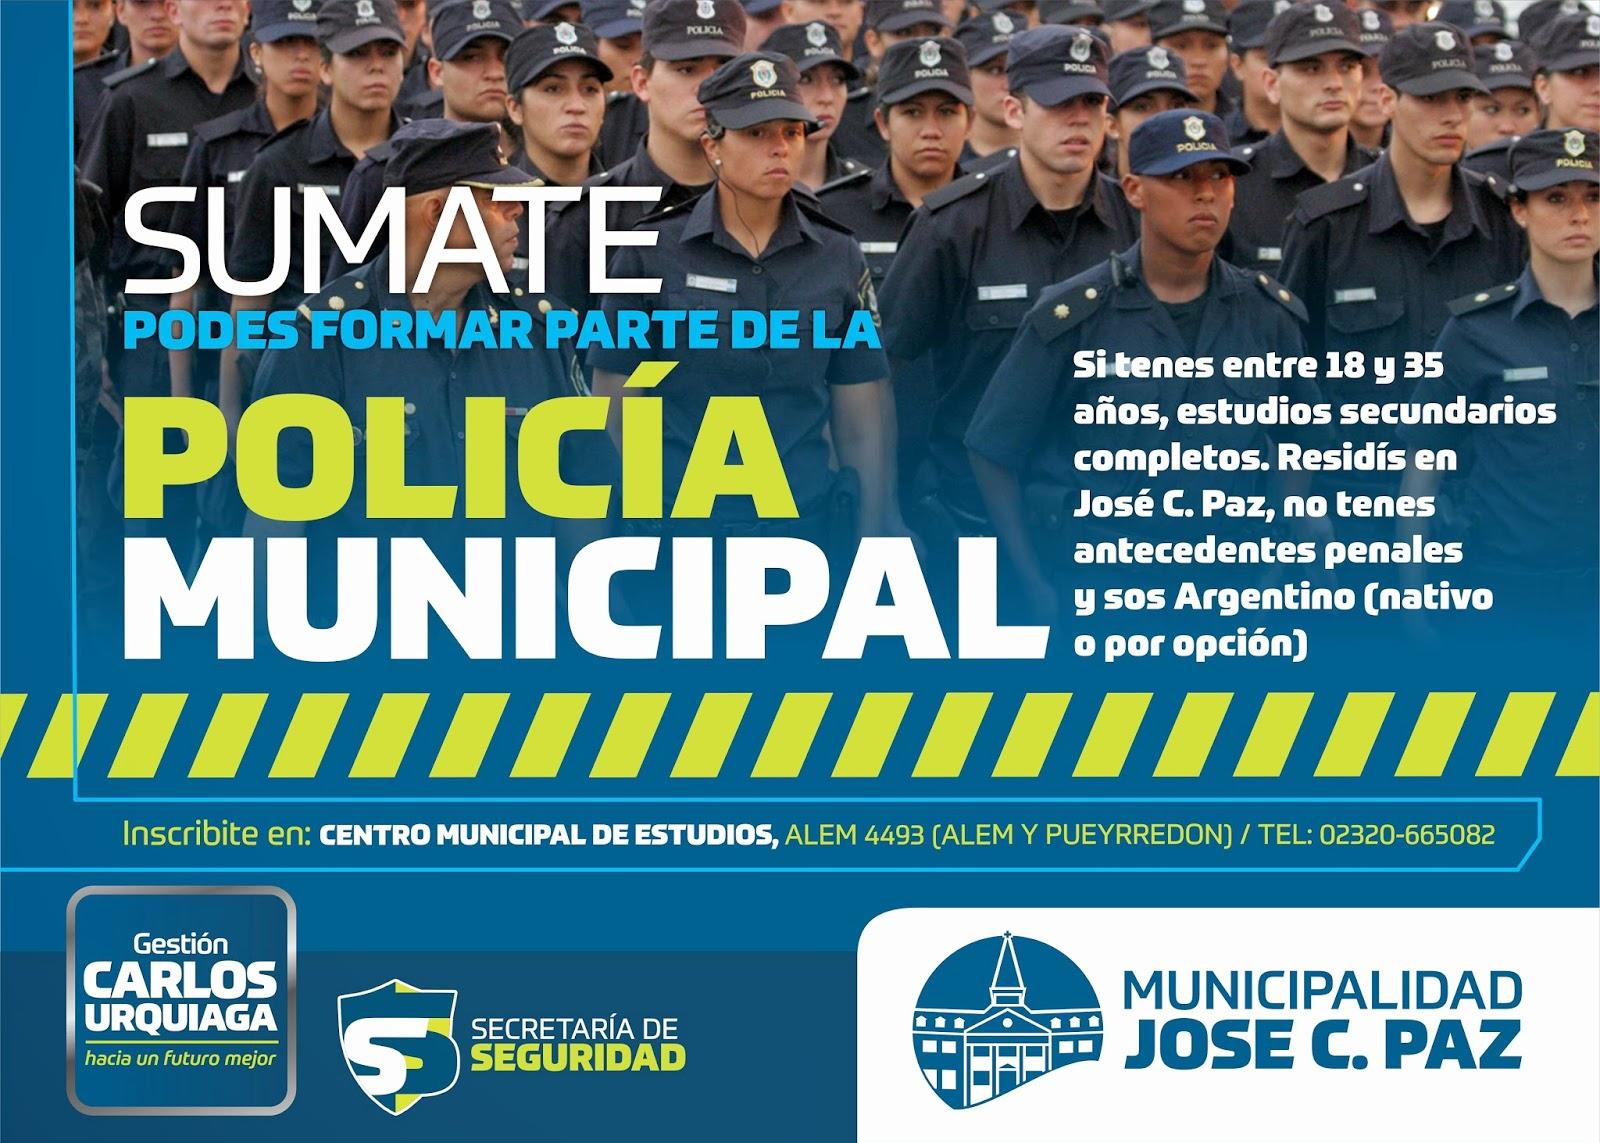 Prensa Municipalidad Jos C Paz